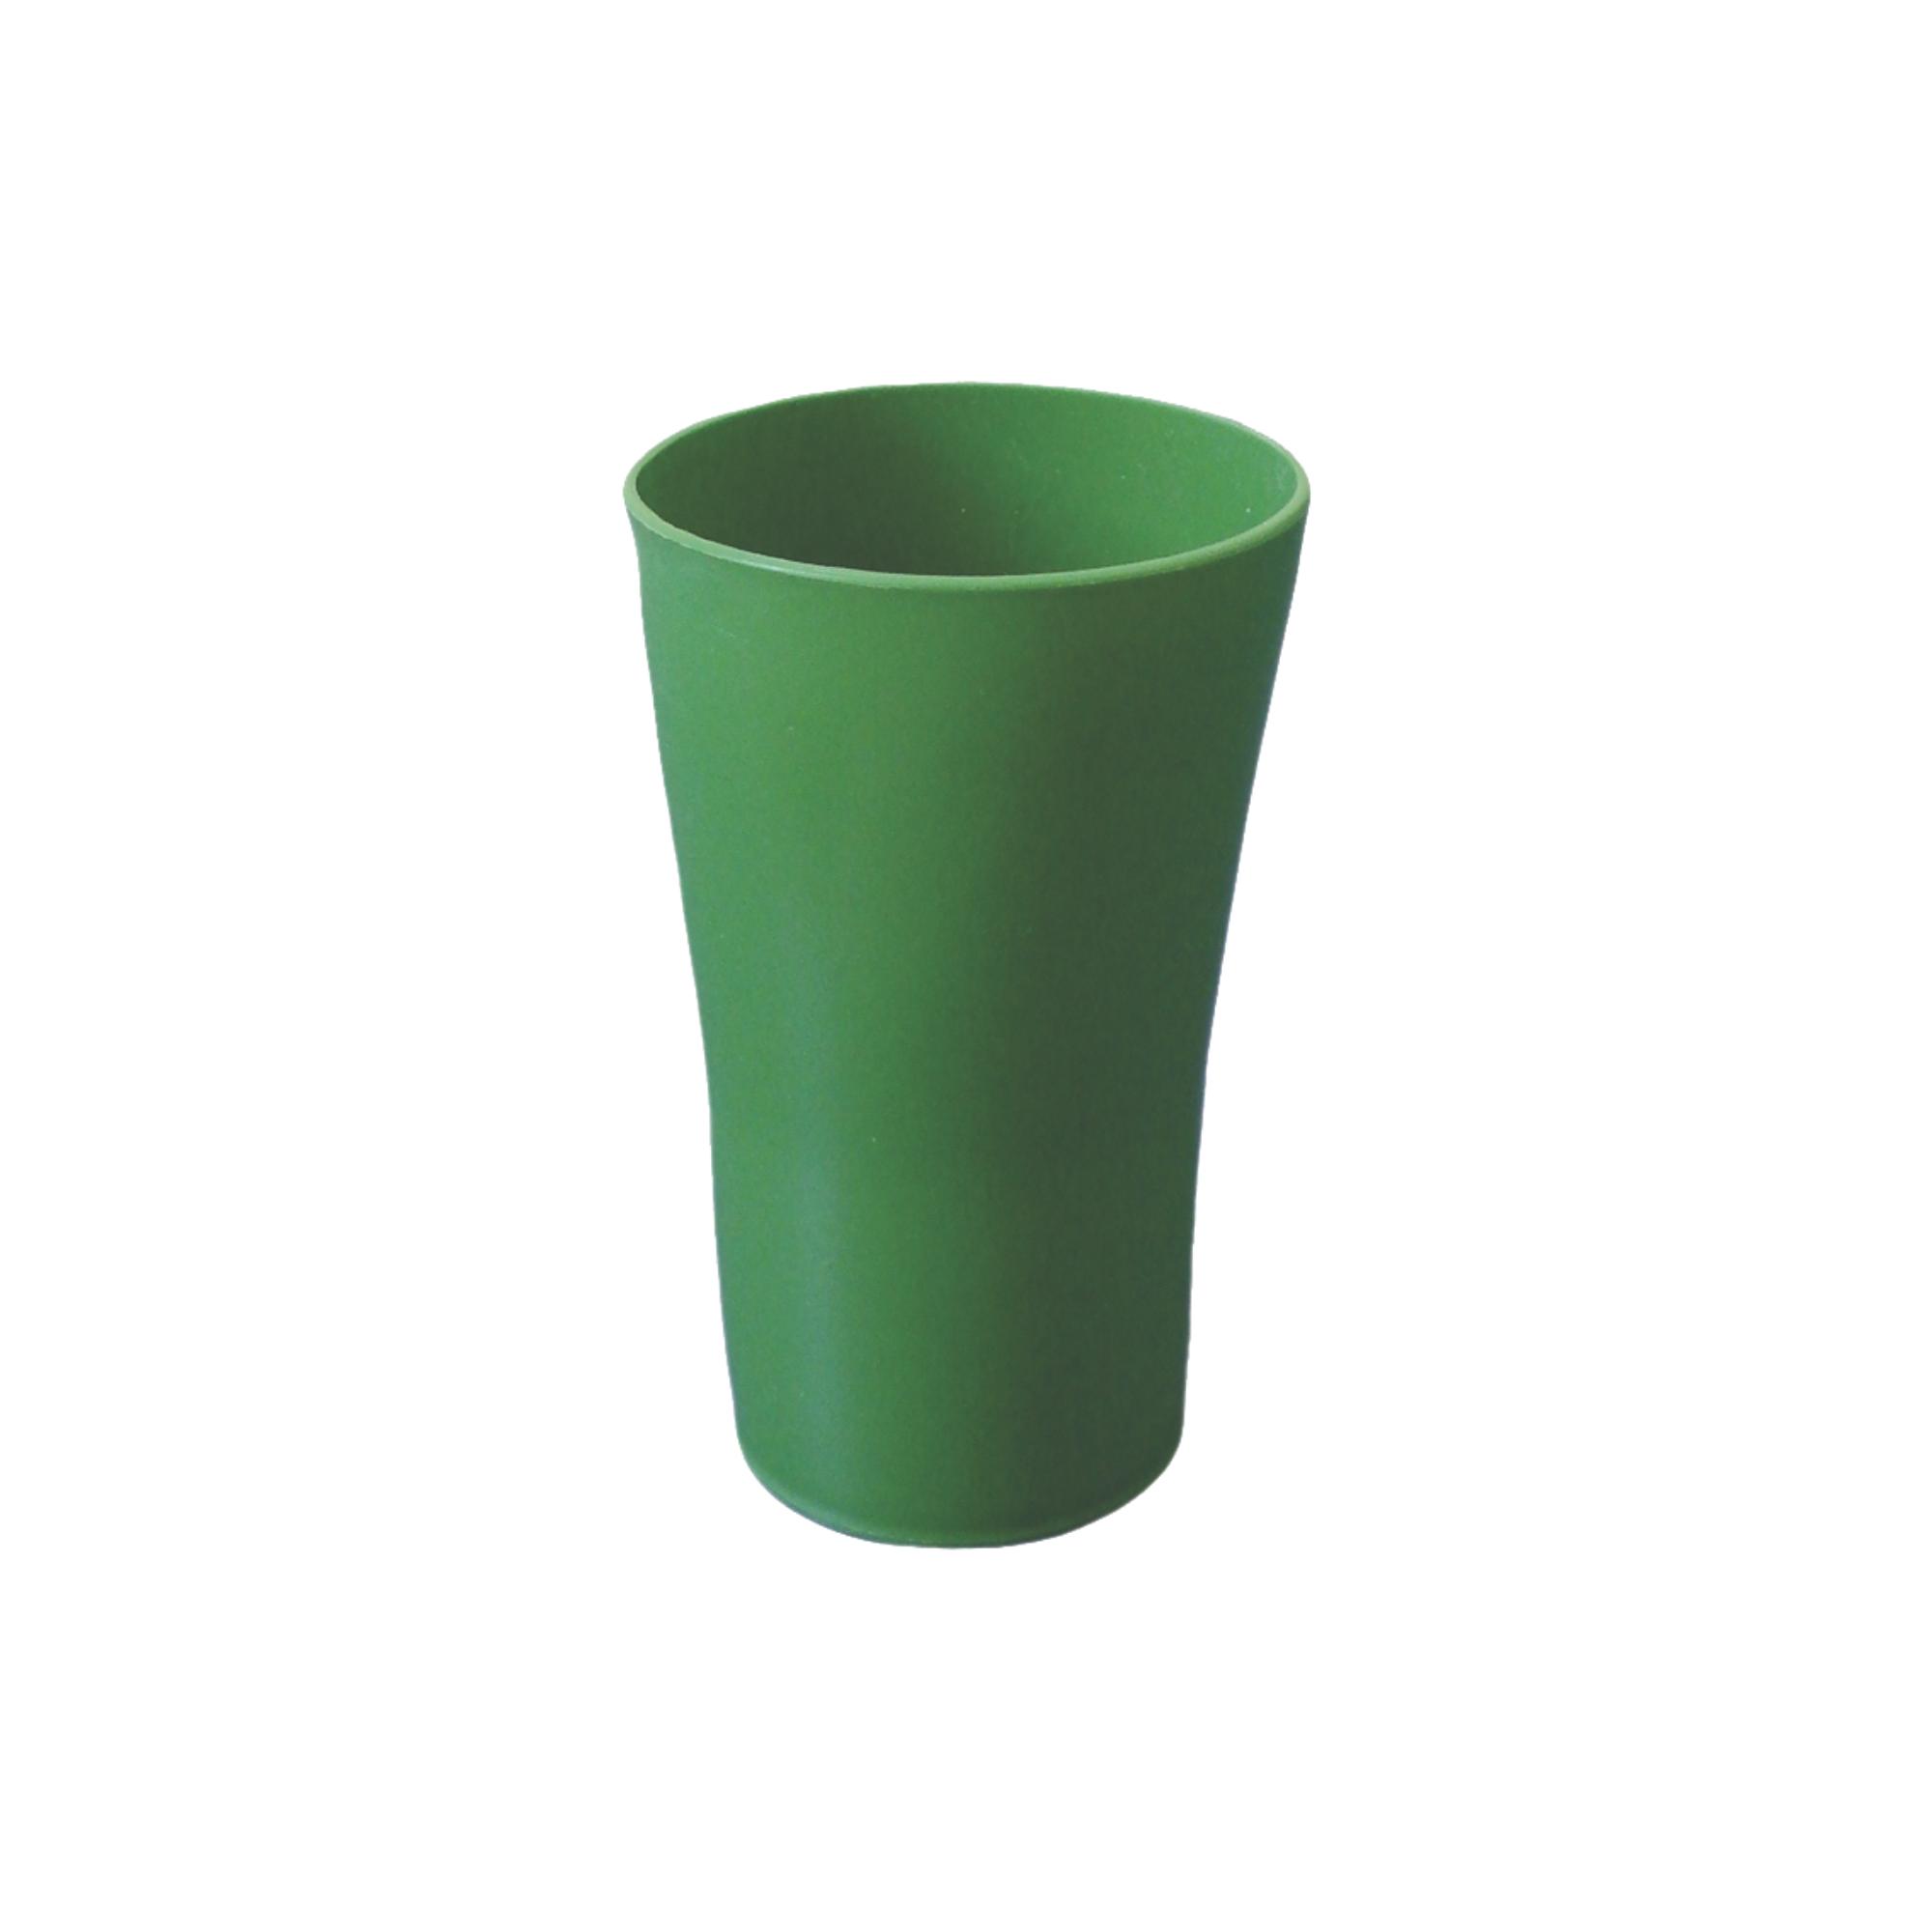 Kit com 12 Copos Plásticos Verdes